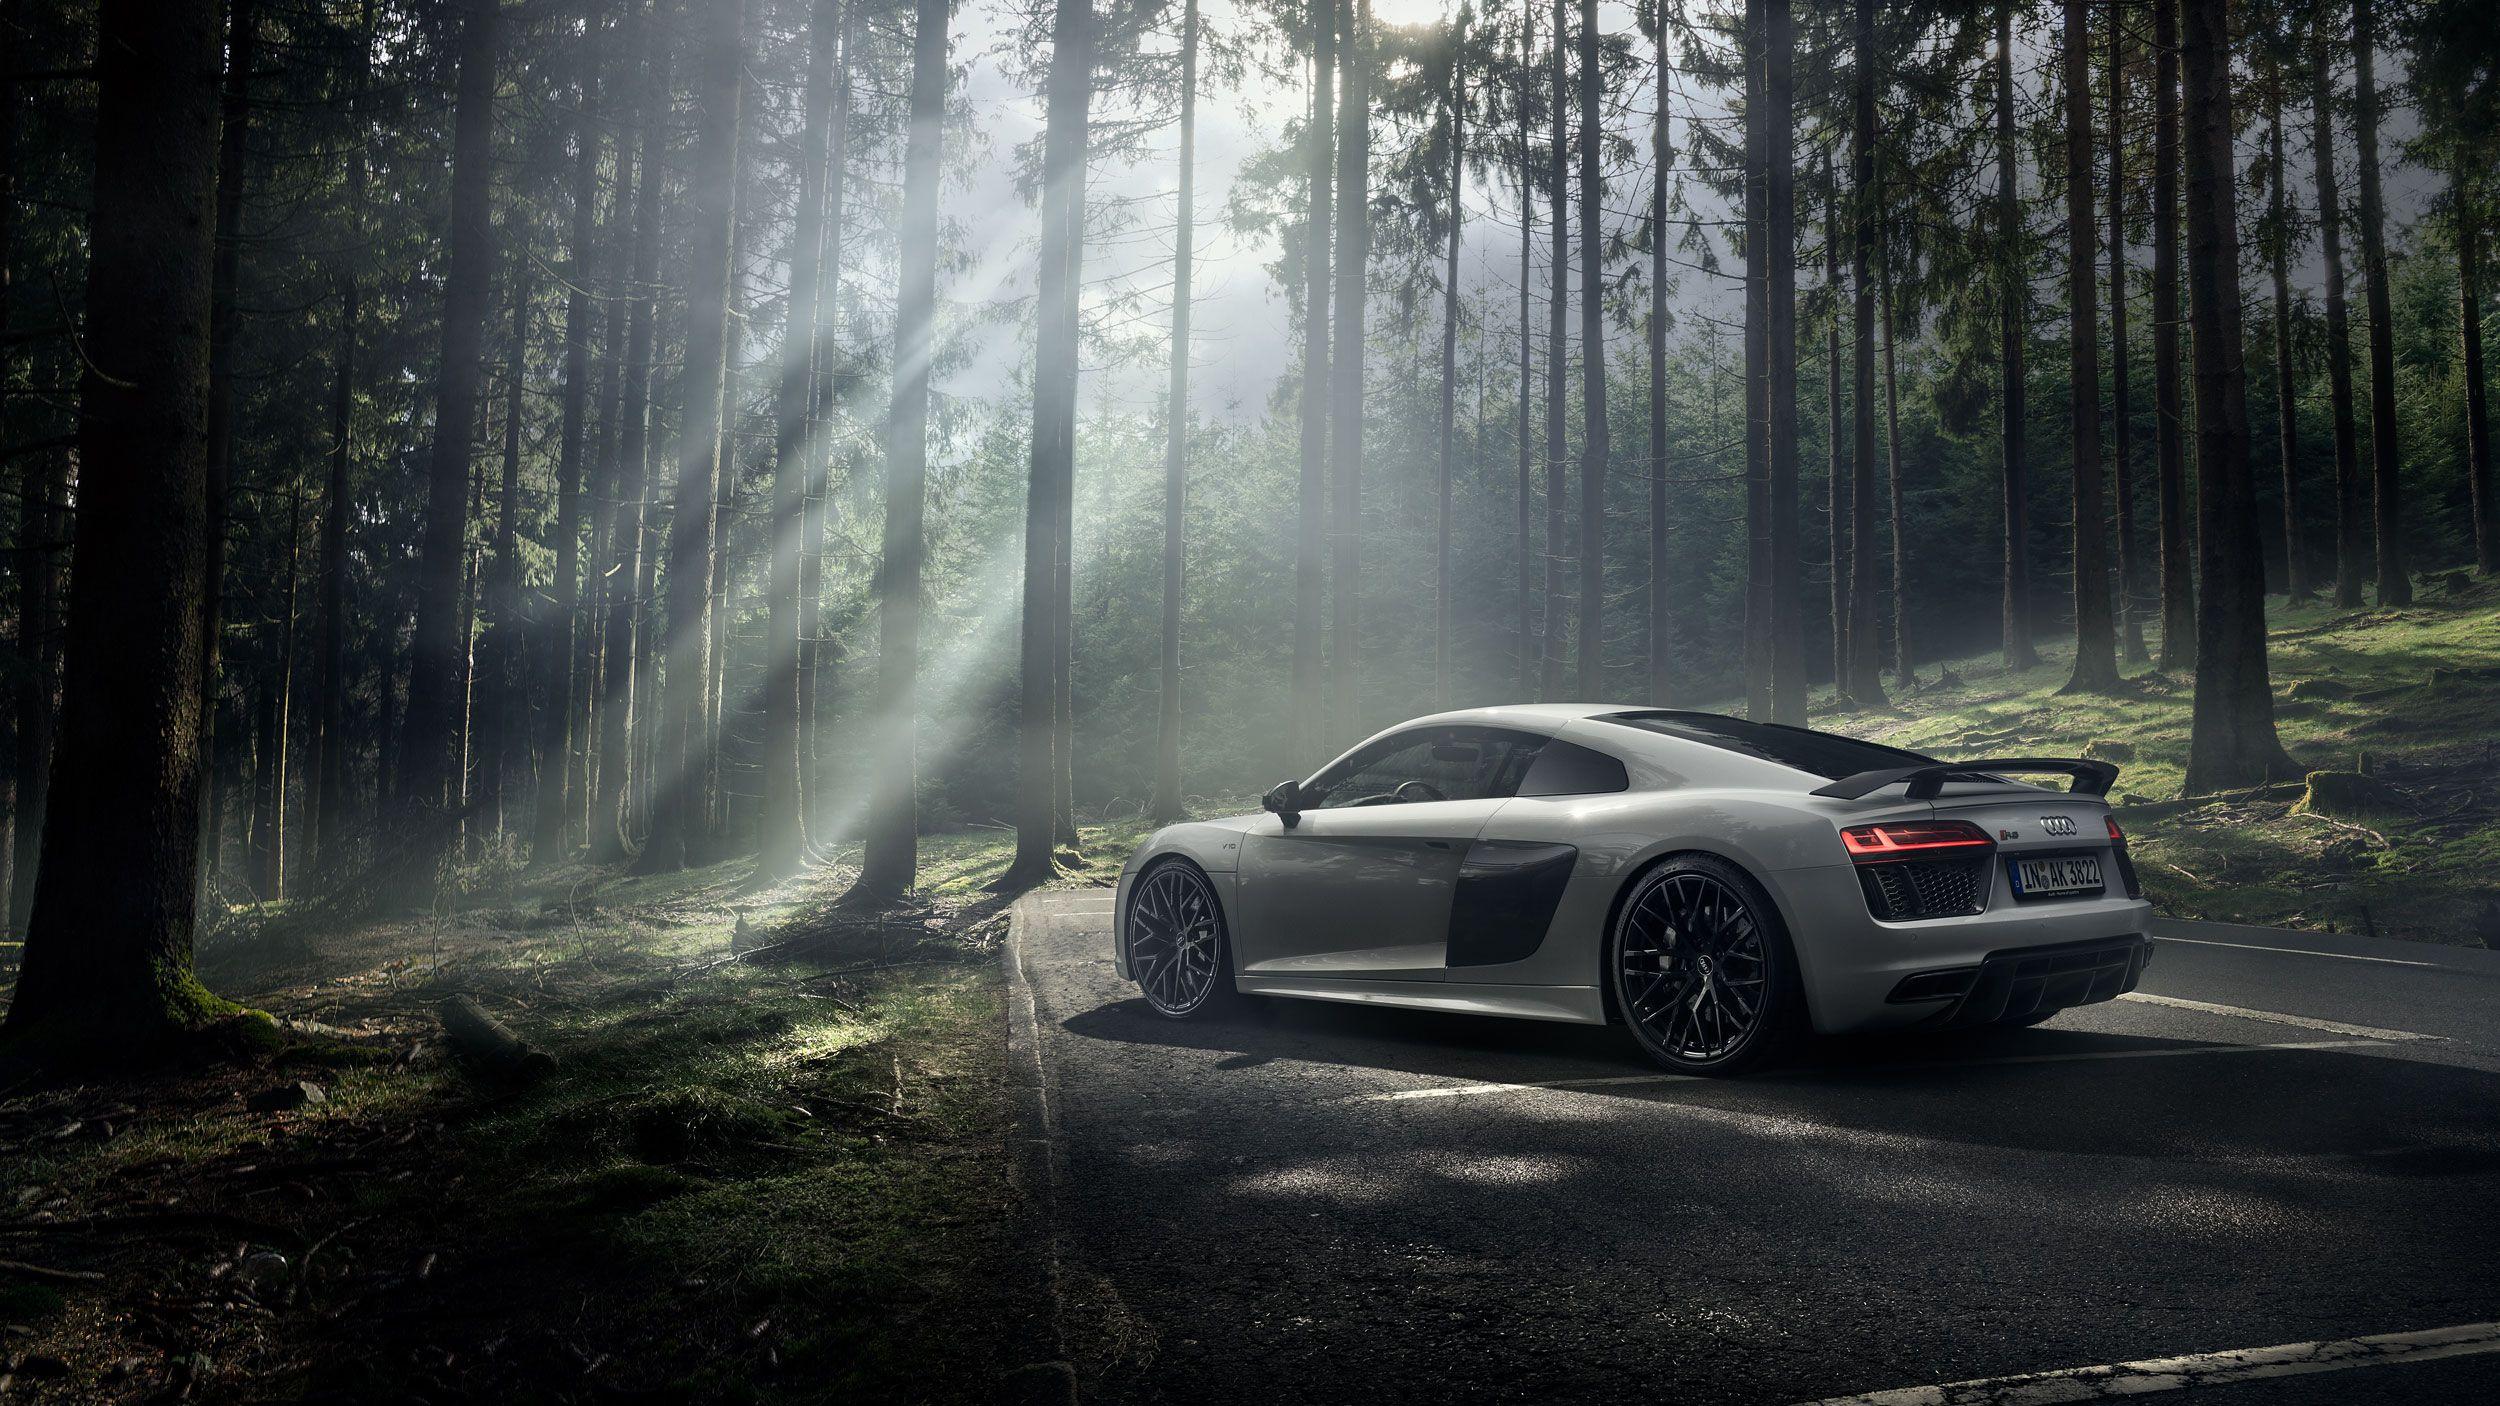 Frederic Schlosser Photography Audi R8 V10 Plus Audi R8 V10